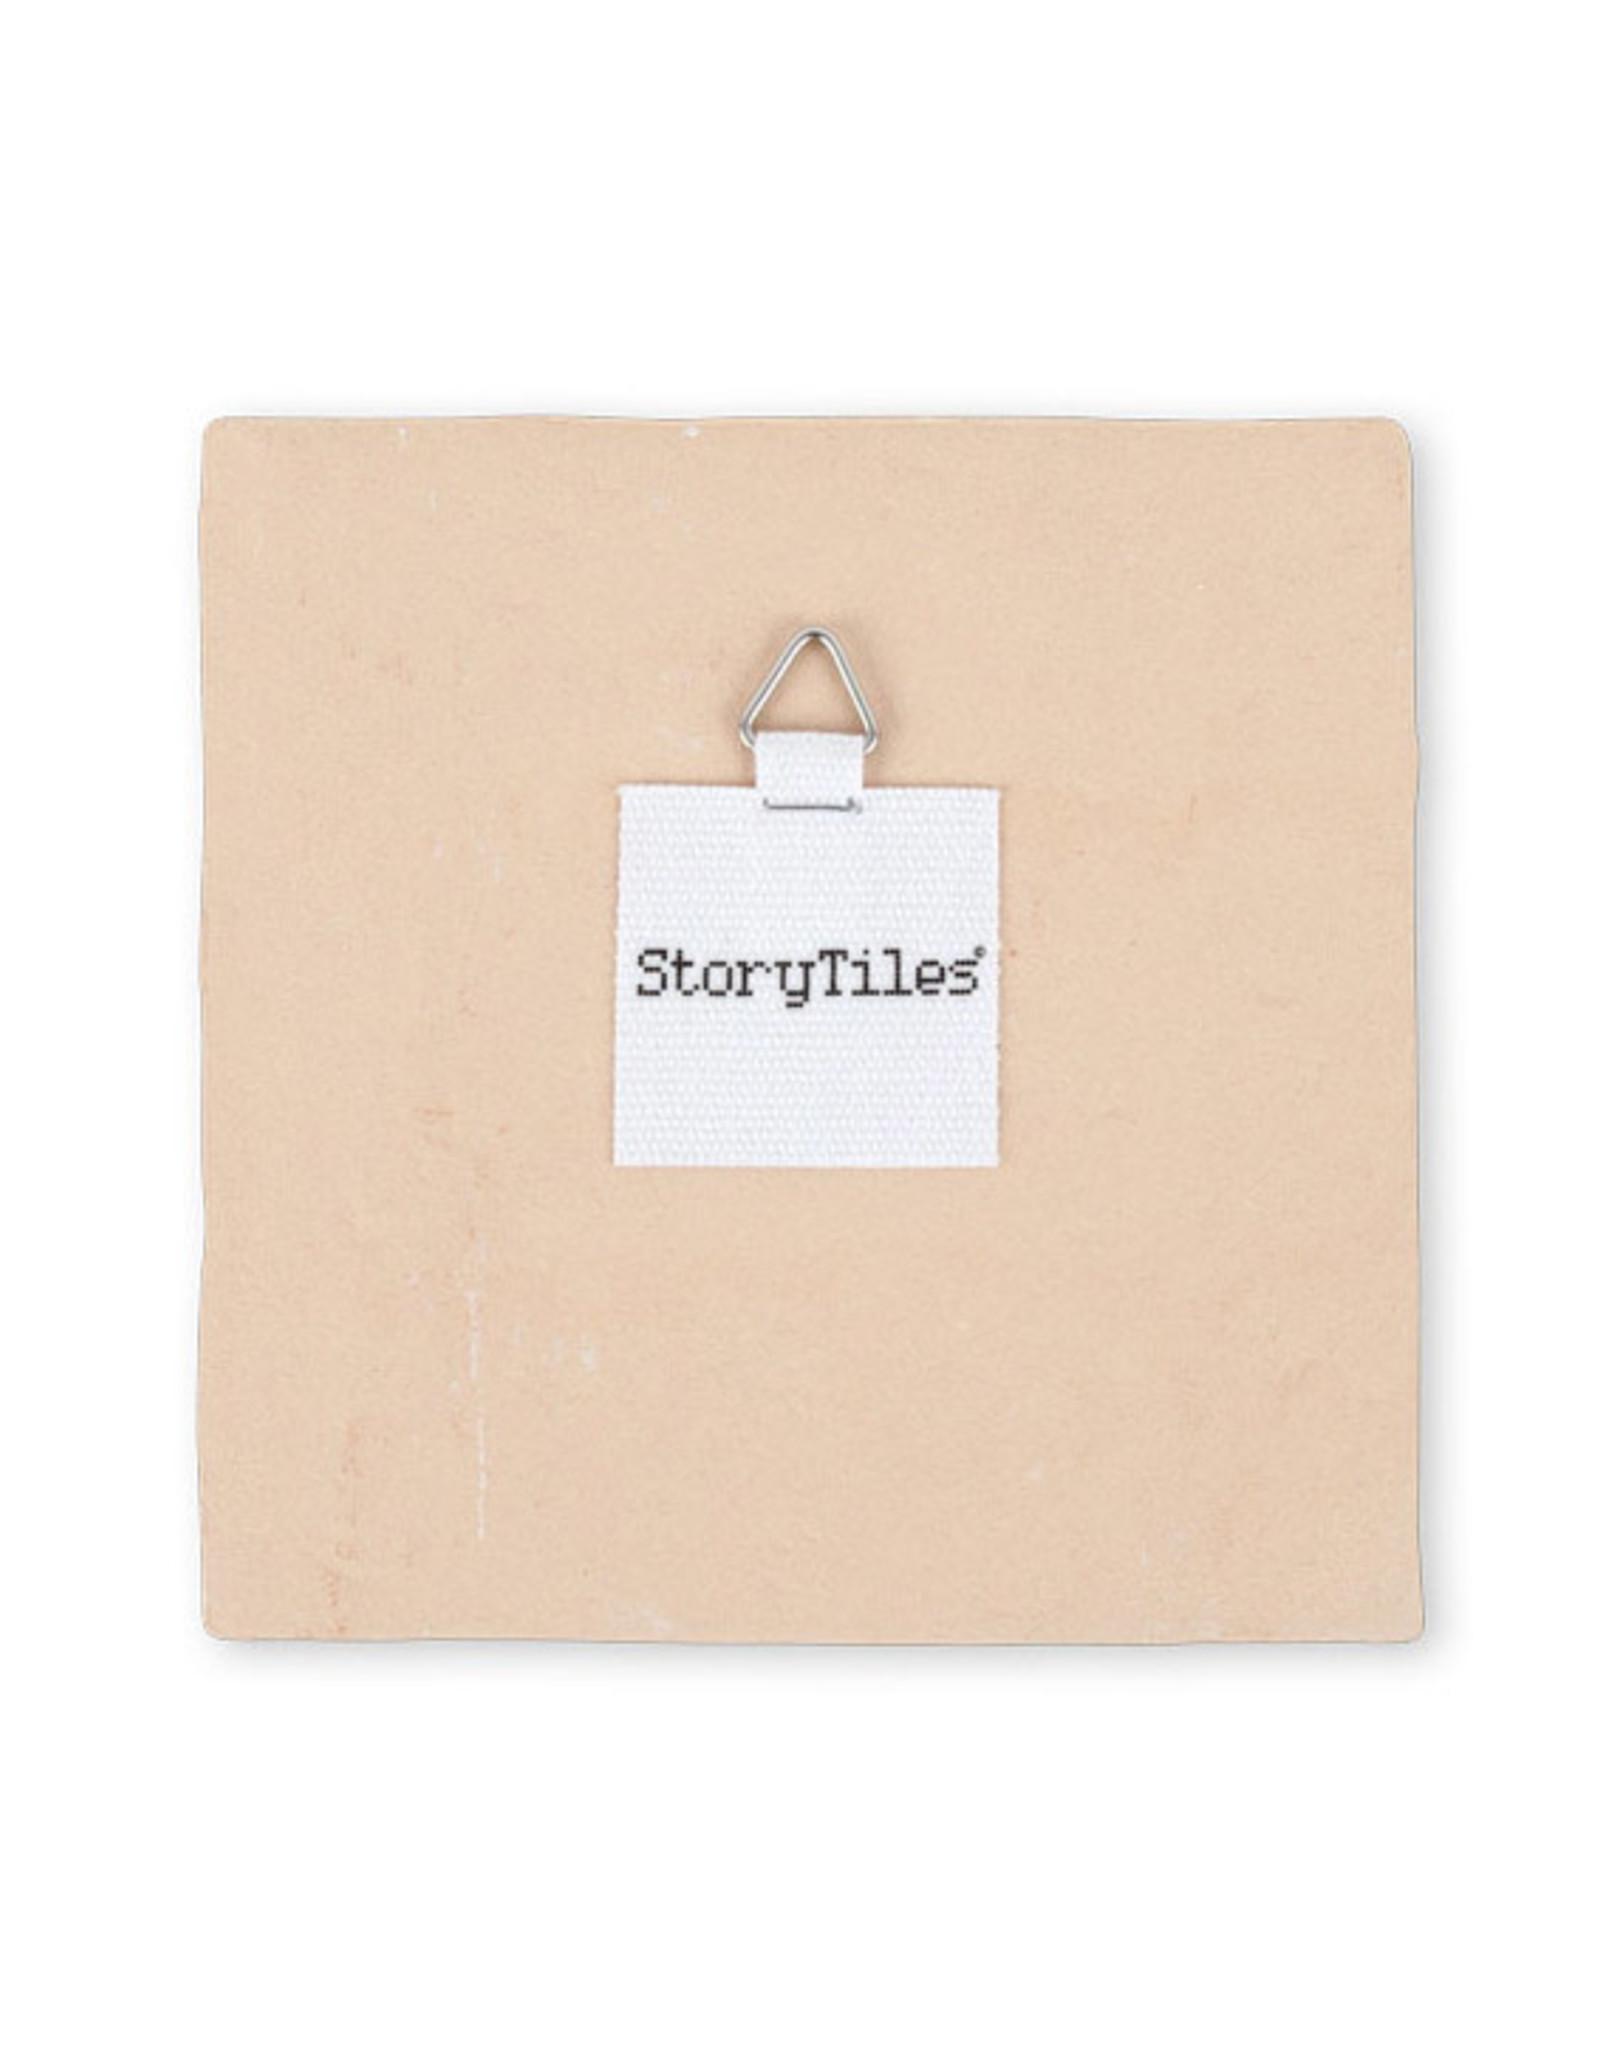 "StoryTiles ""swimming"" Tile"